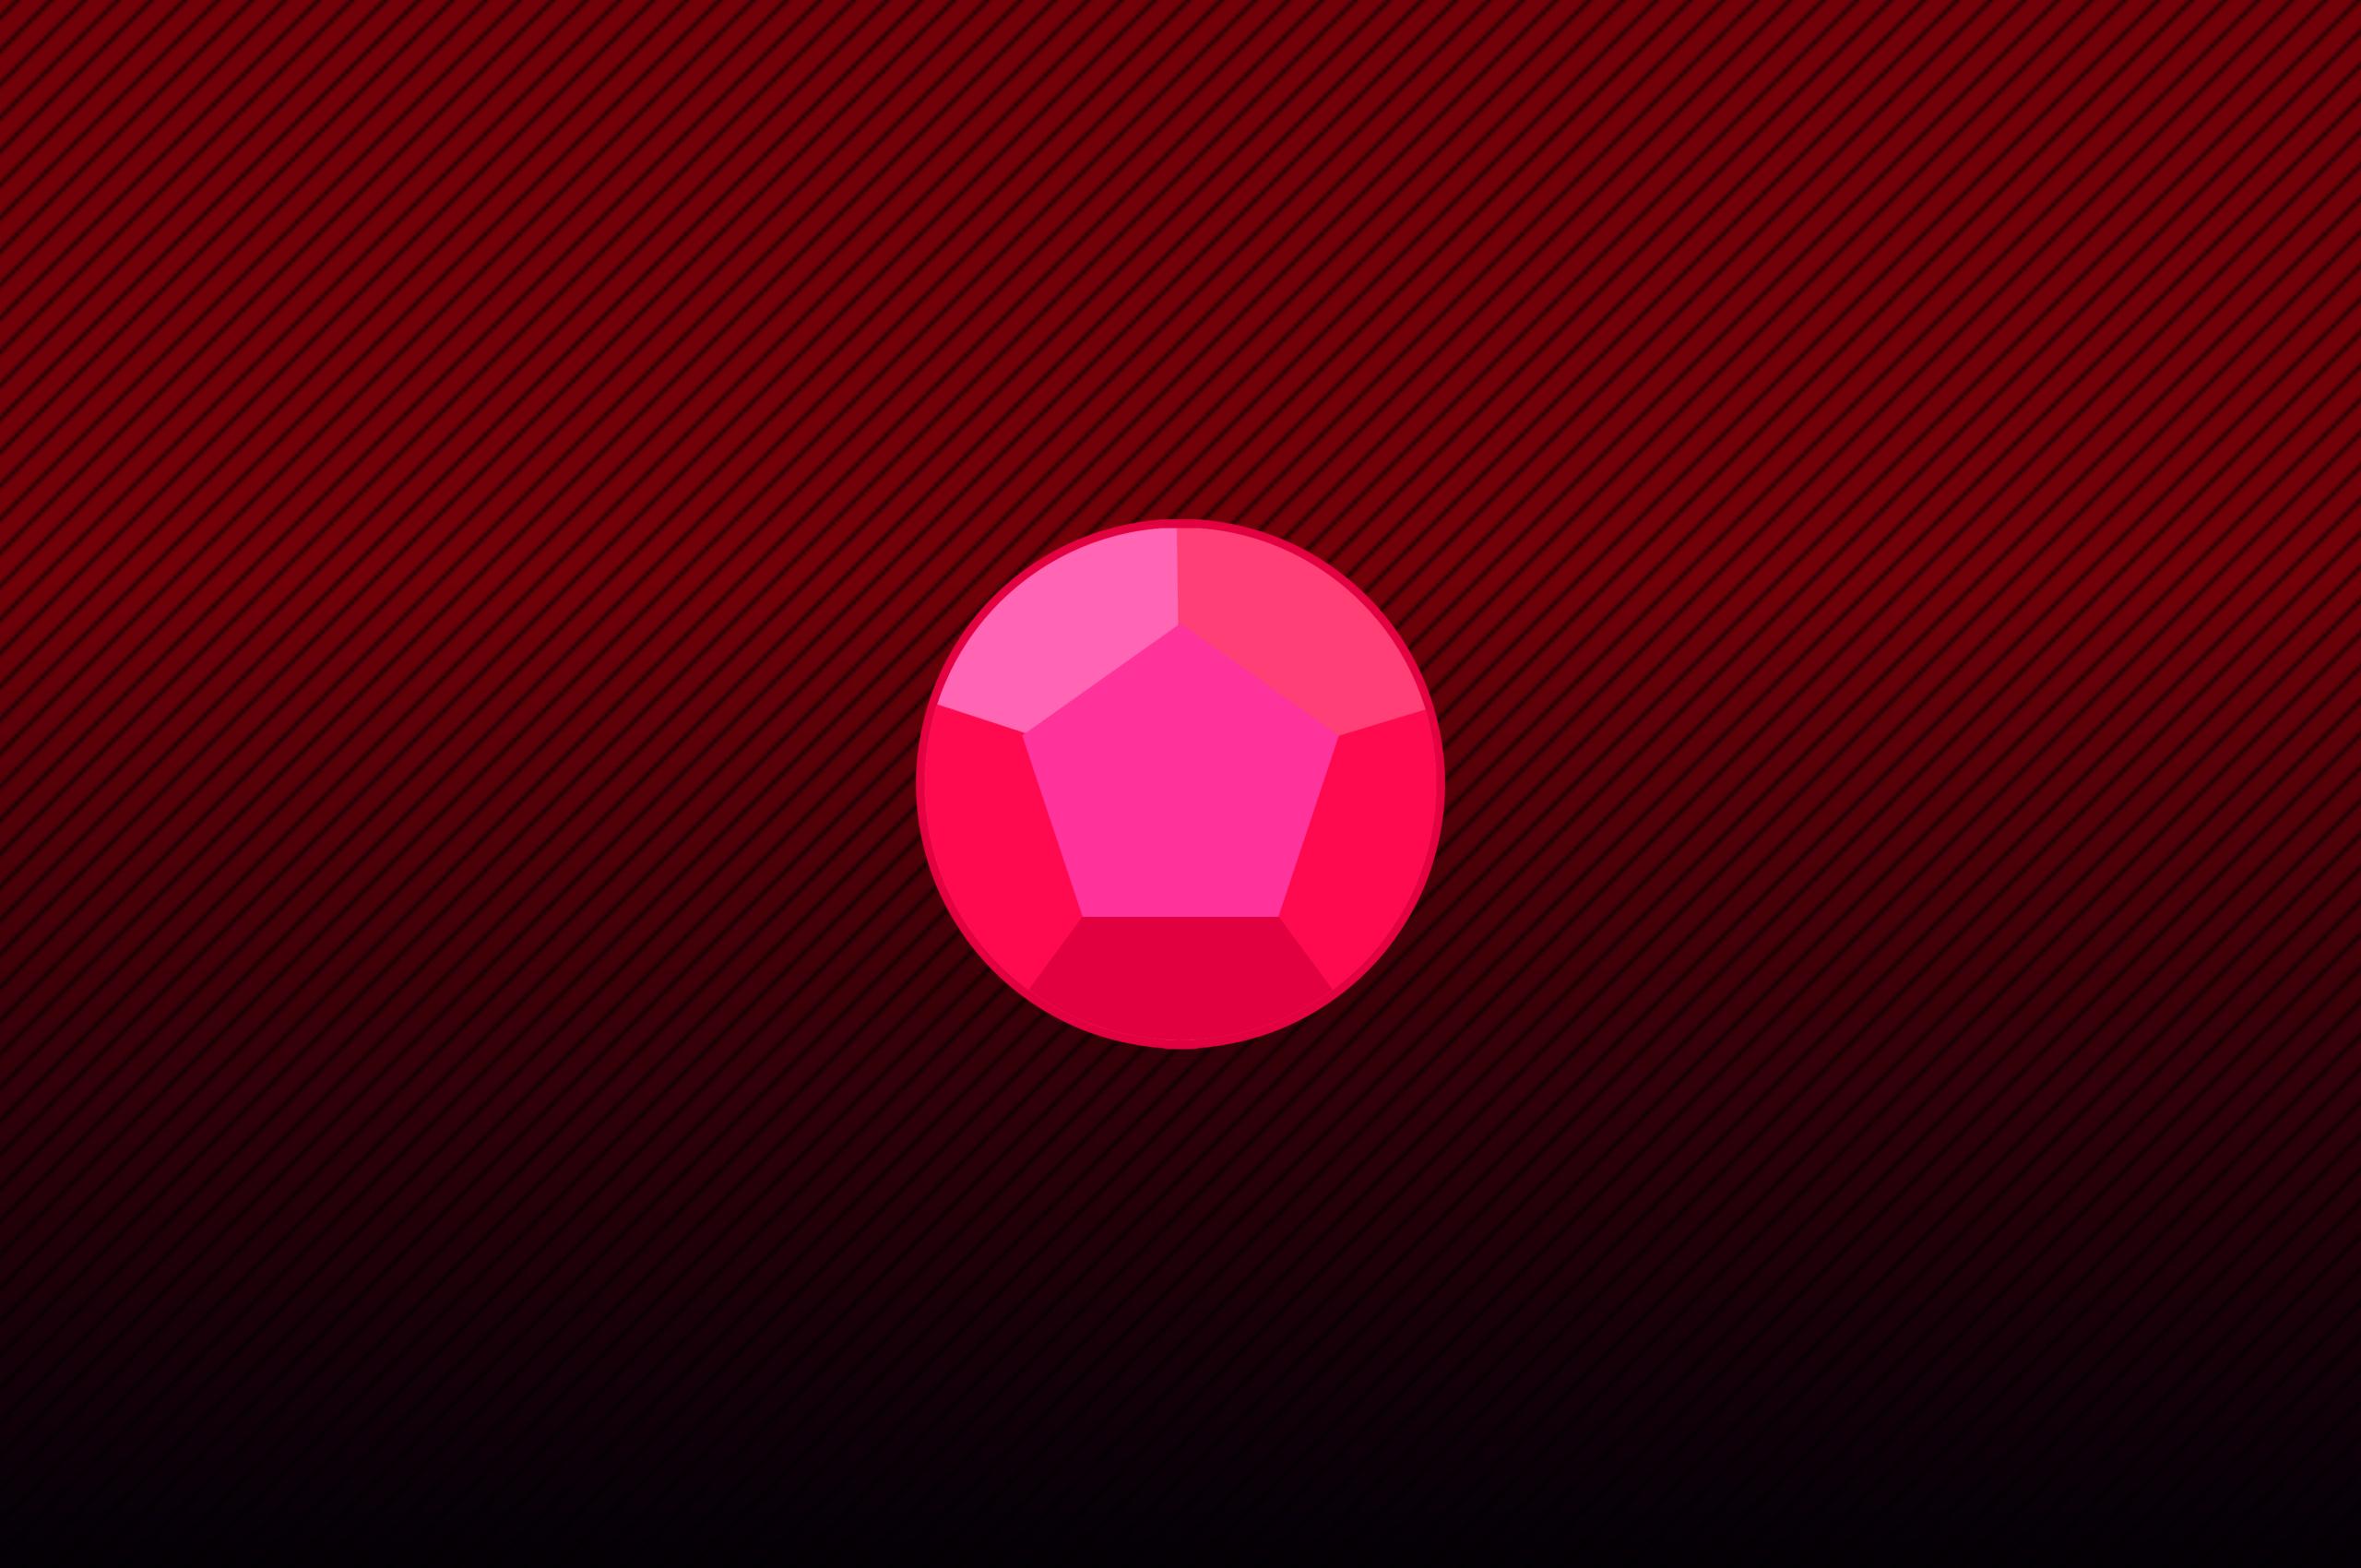 2560x1700 Steven Universe Minimalist Chromebook Pixel